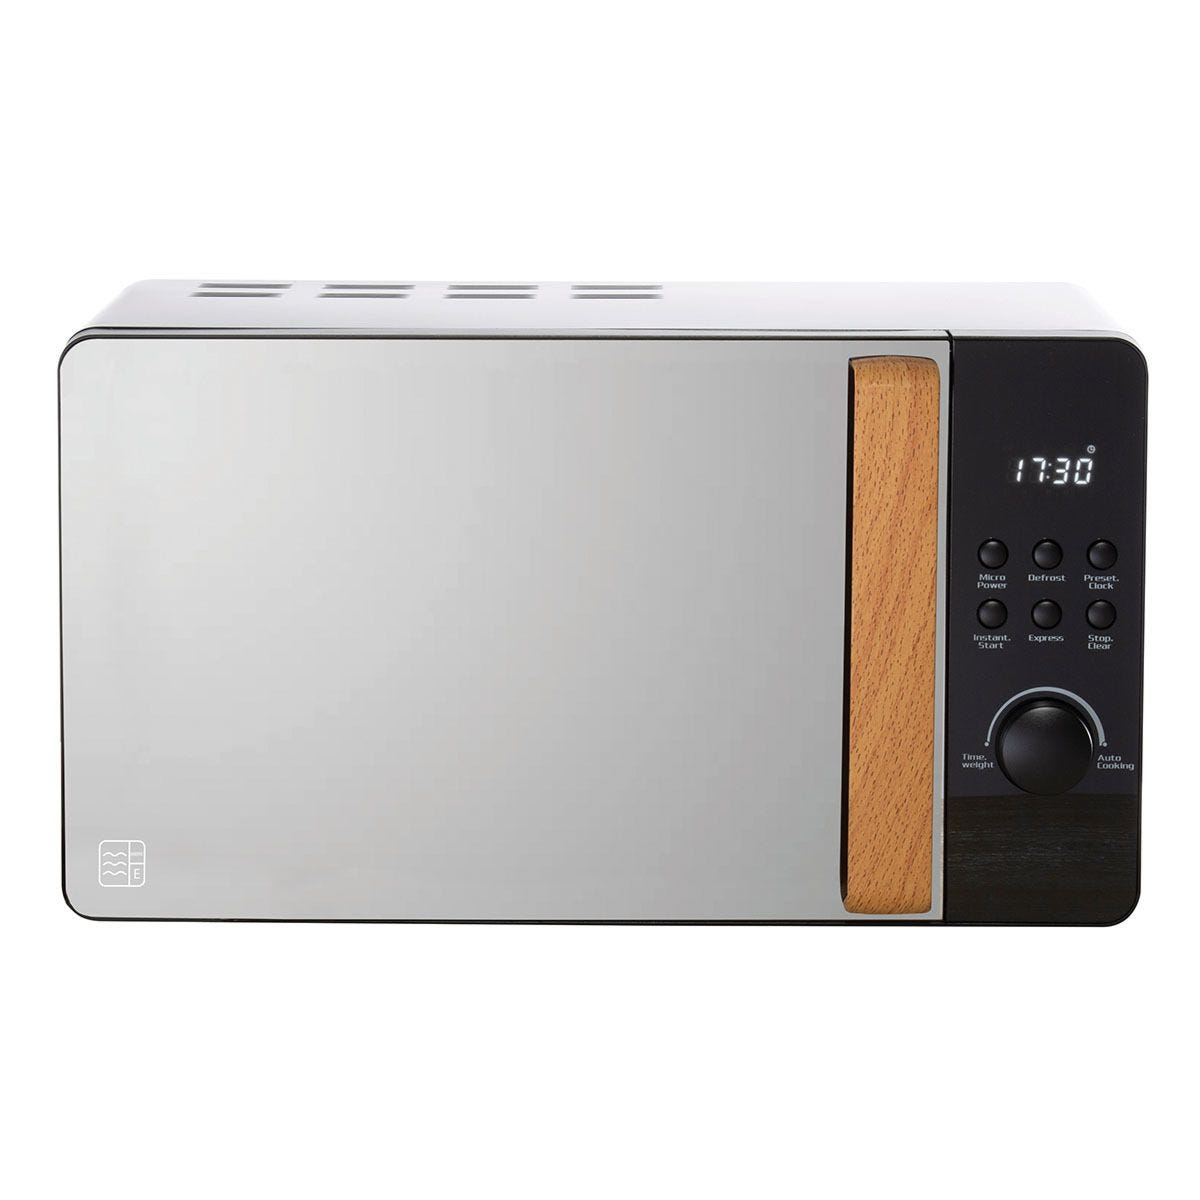 Daewoo Skandik 20L 800W Wooden-Handled Digital Microwave - Black